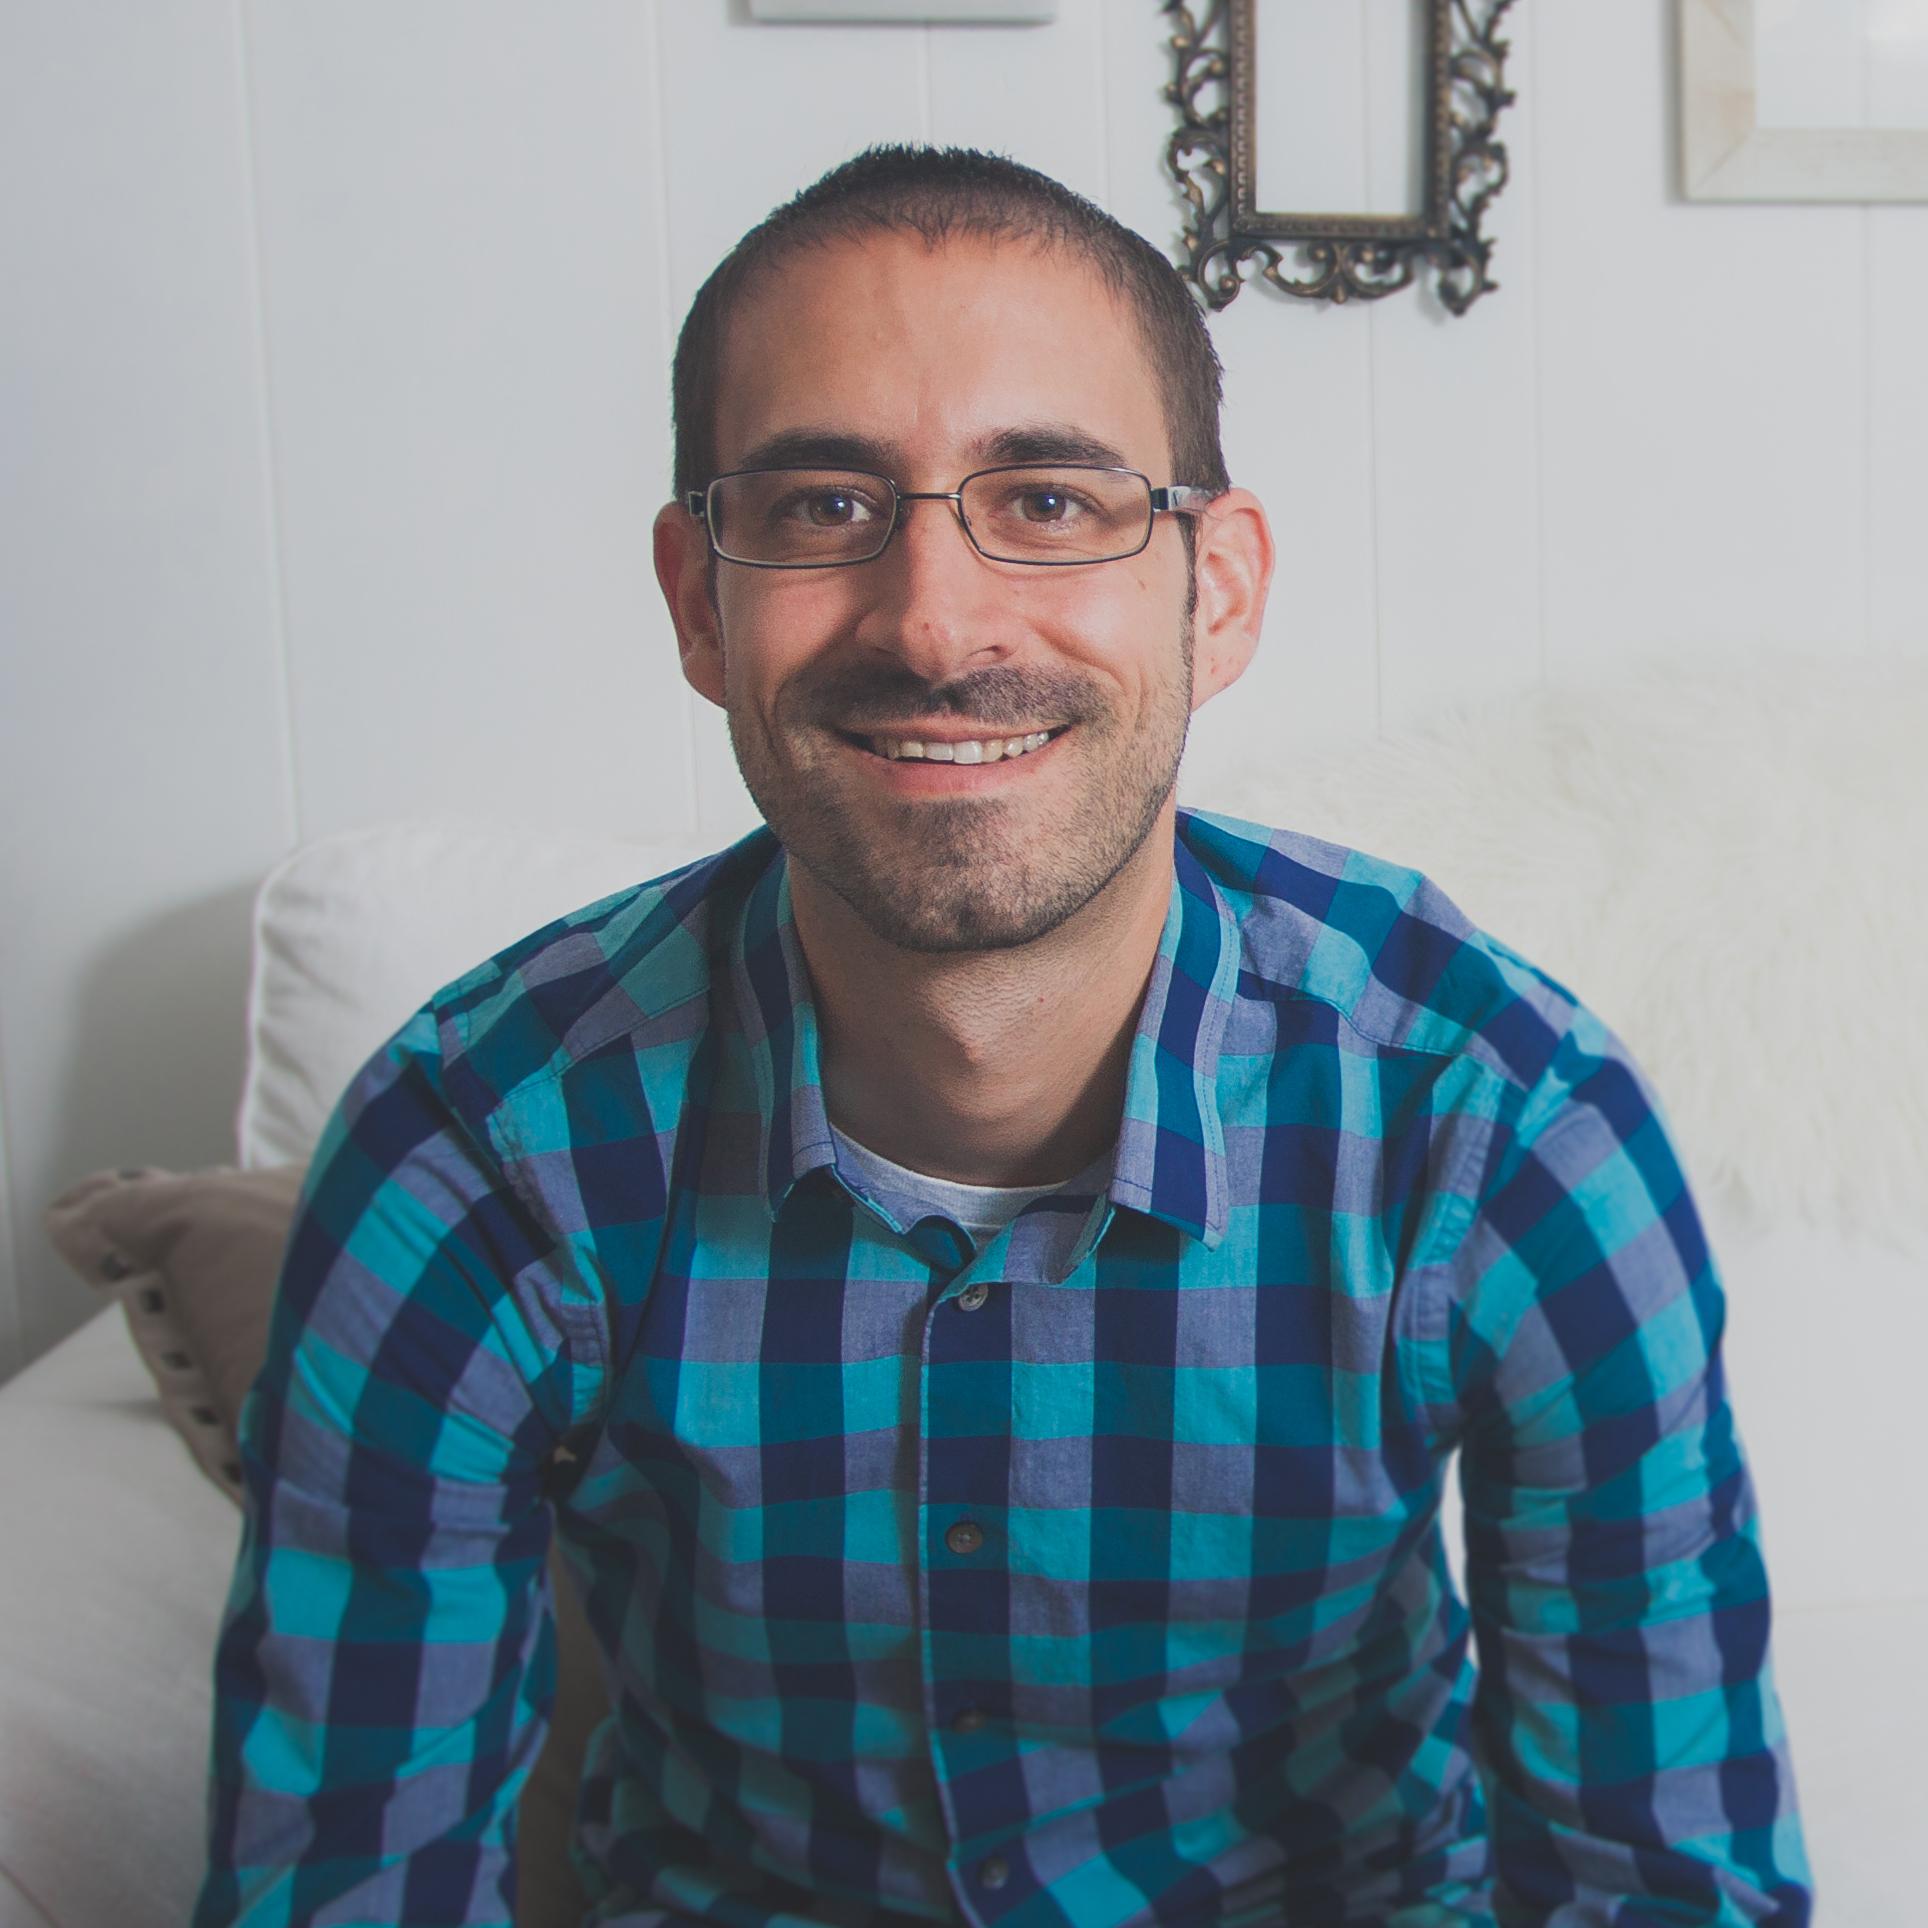 Daniel Fava